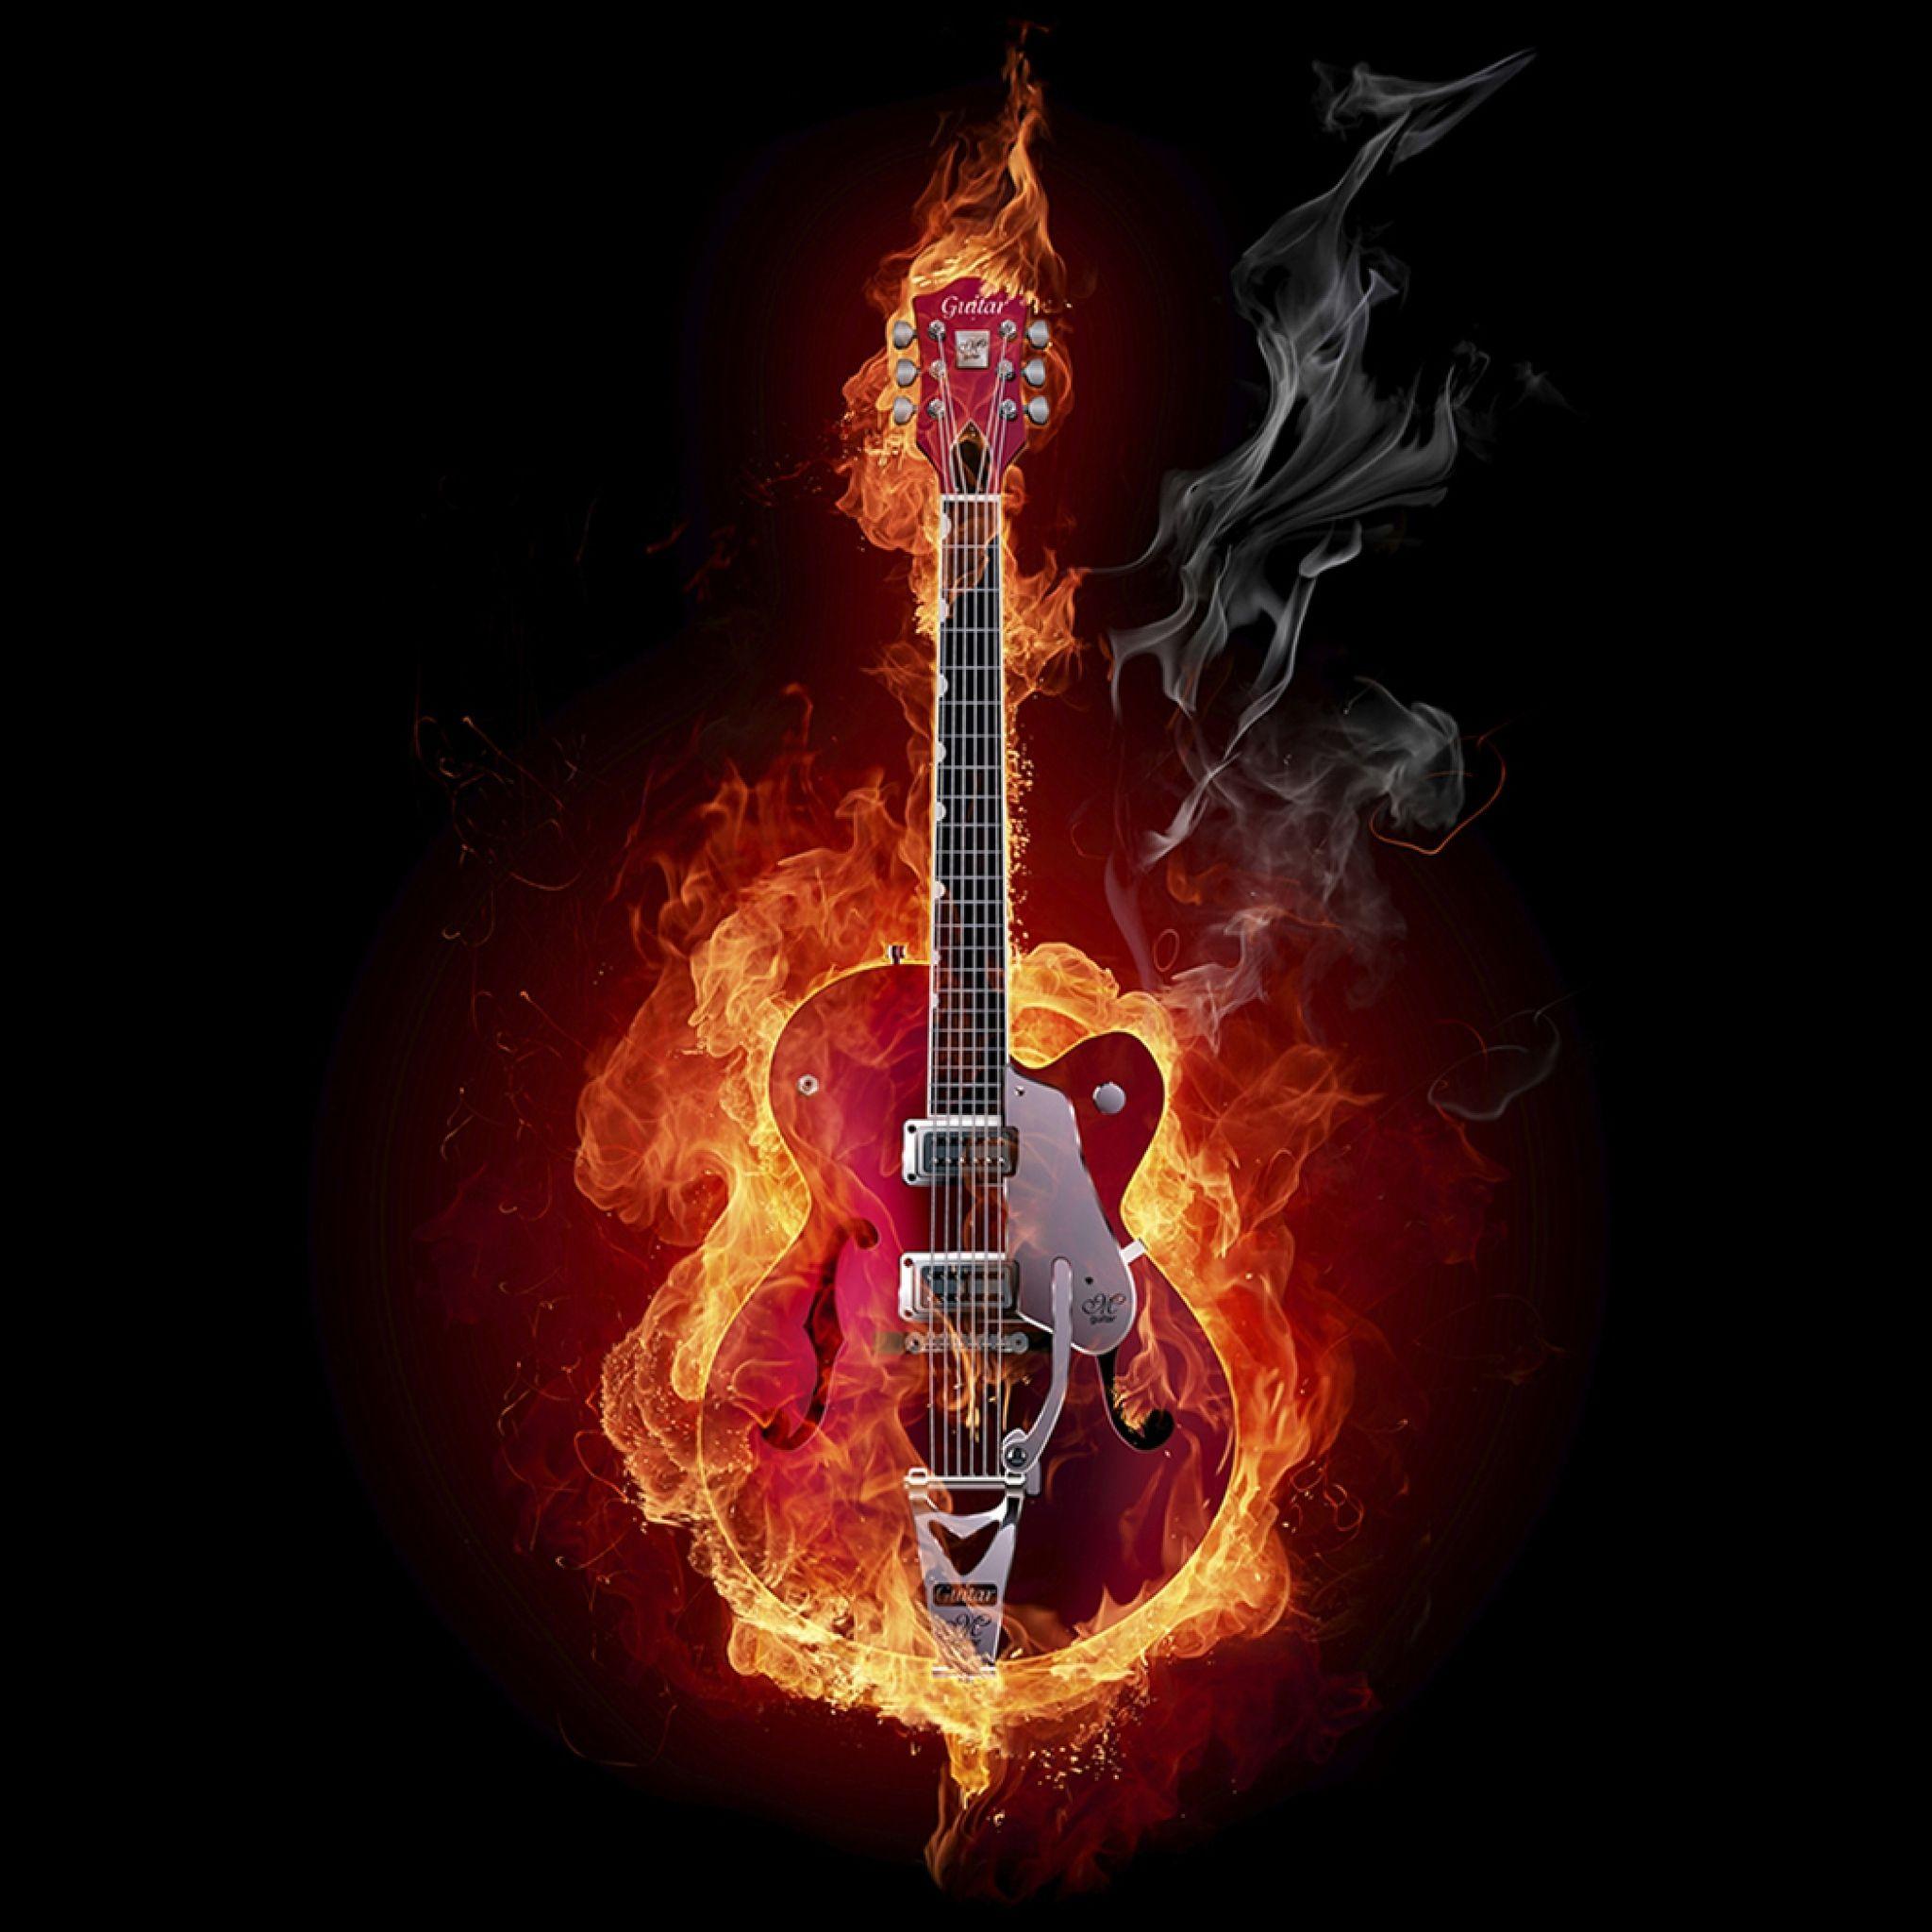 2048x2048 Wallpaper guitarra fogo instrumento fuma§a fundo